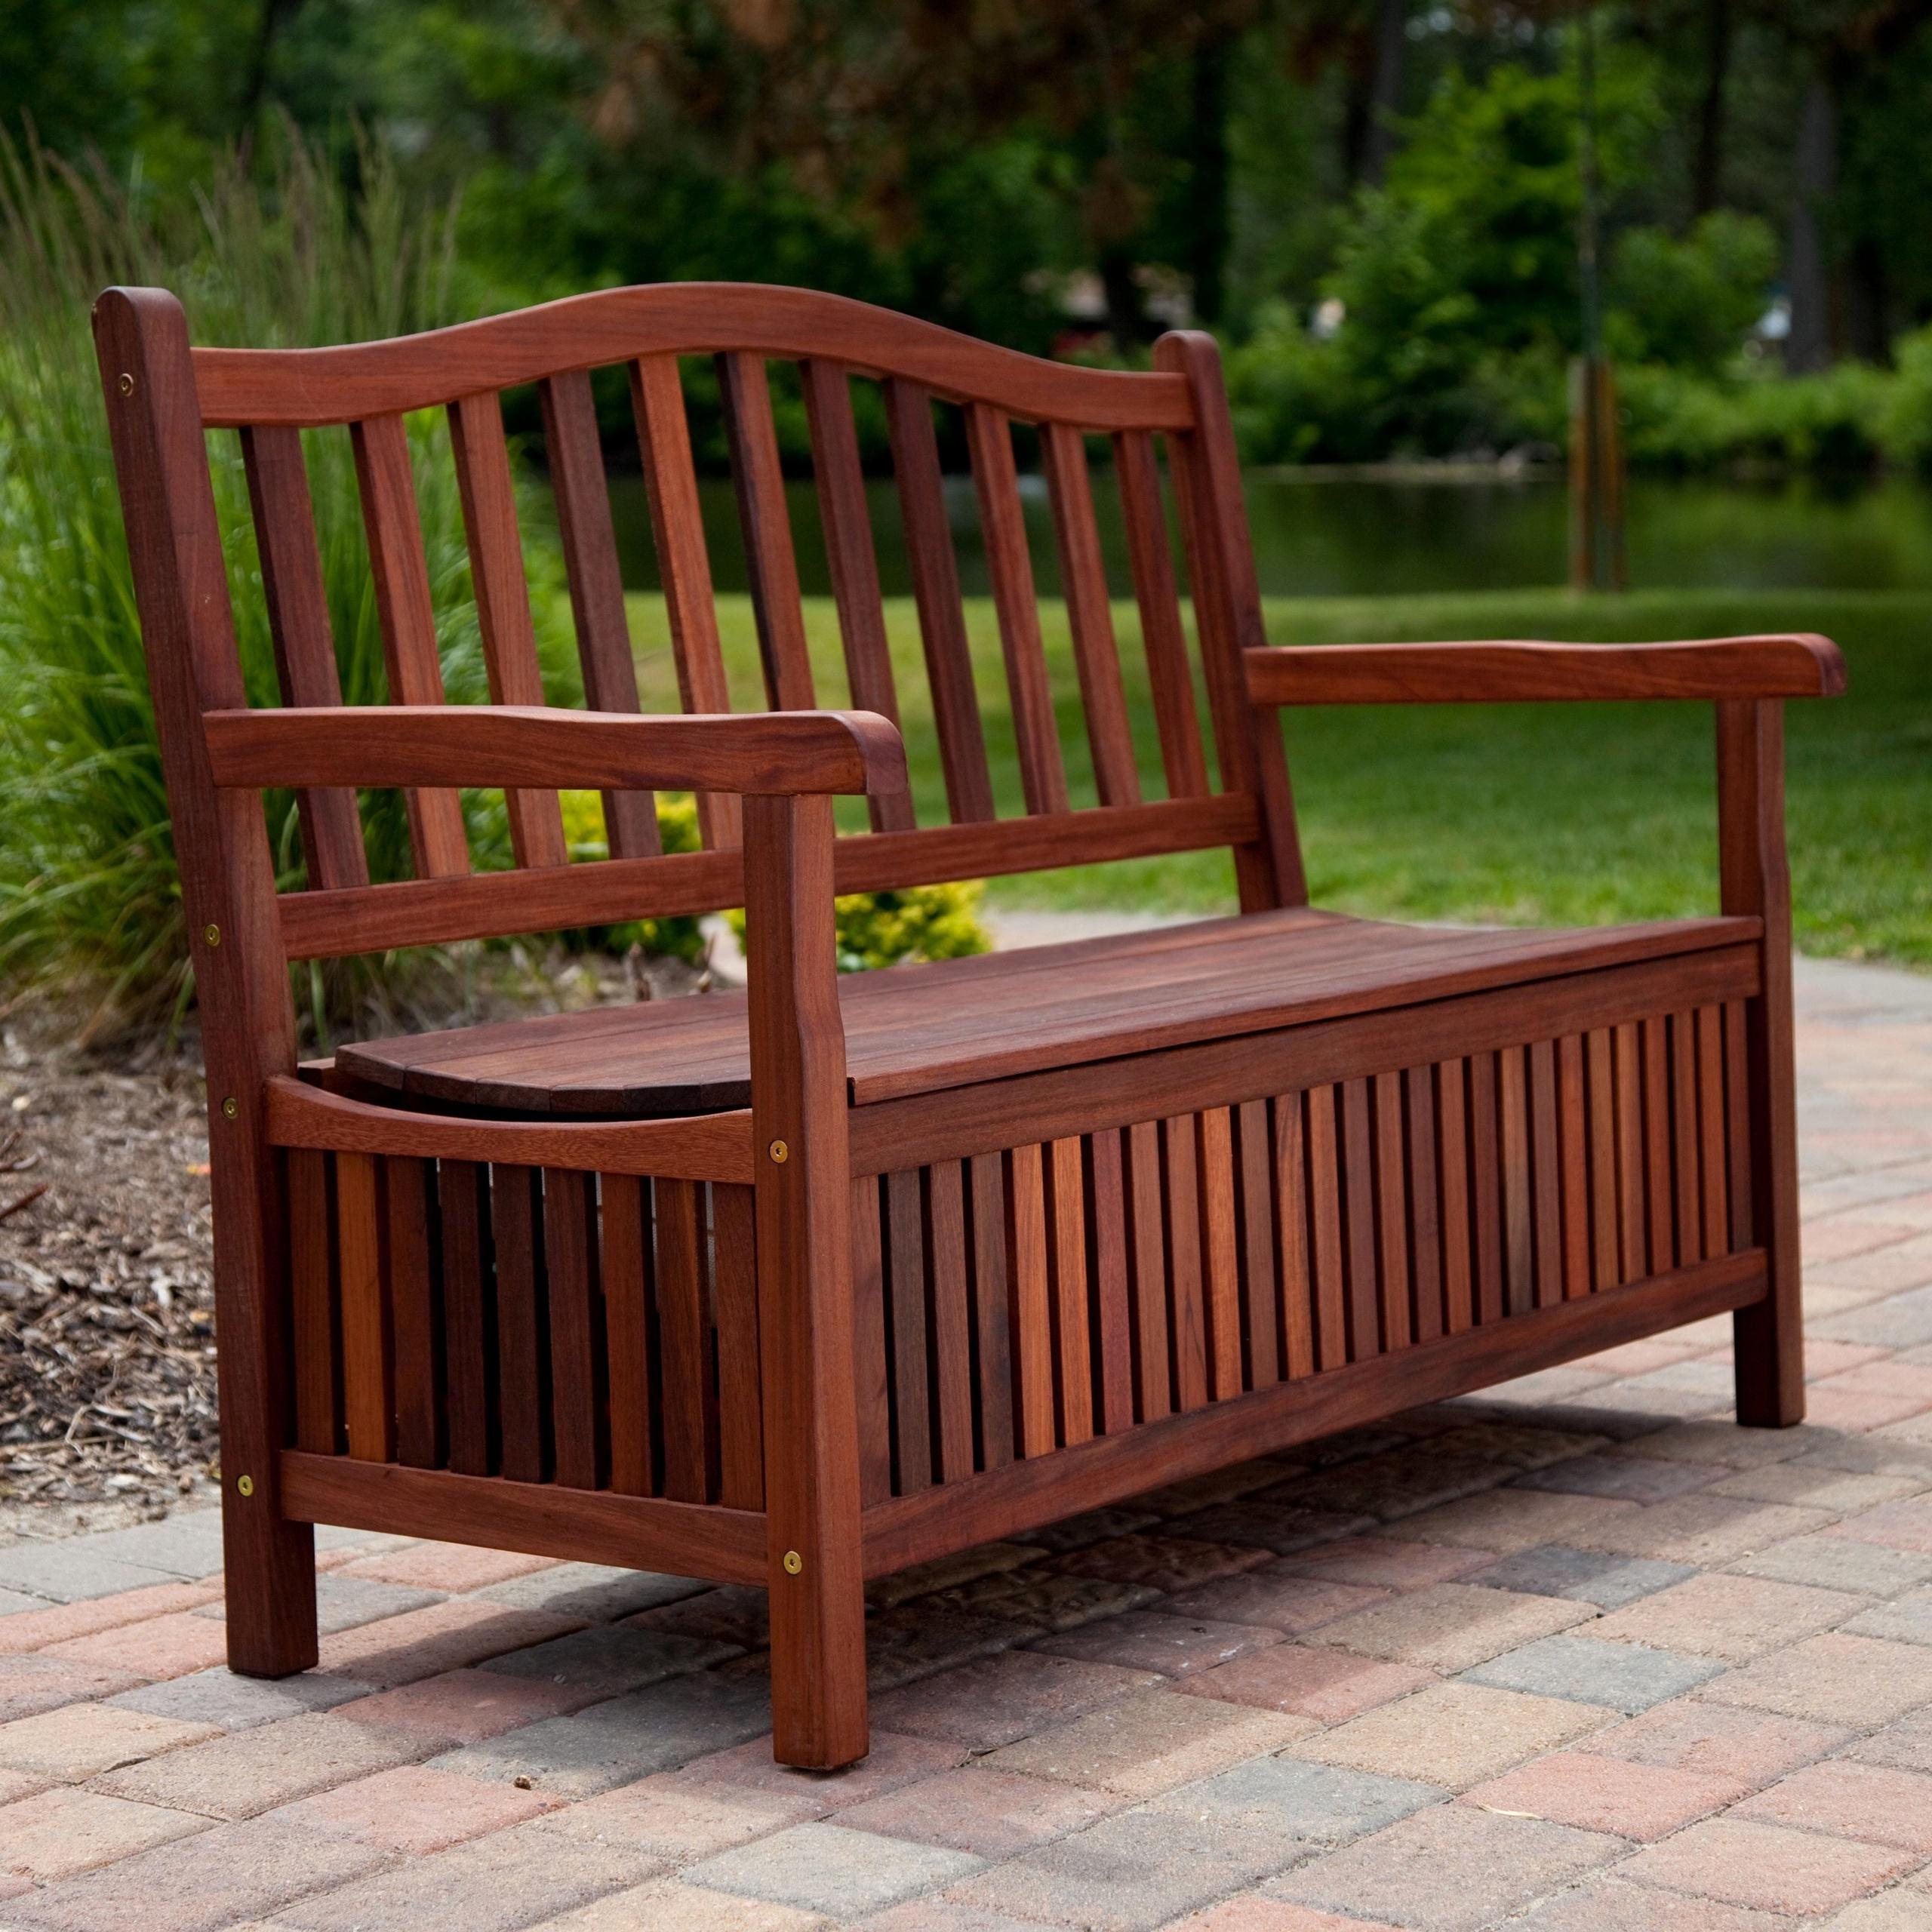 Teak Type 4 Patio Storage Bench